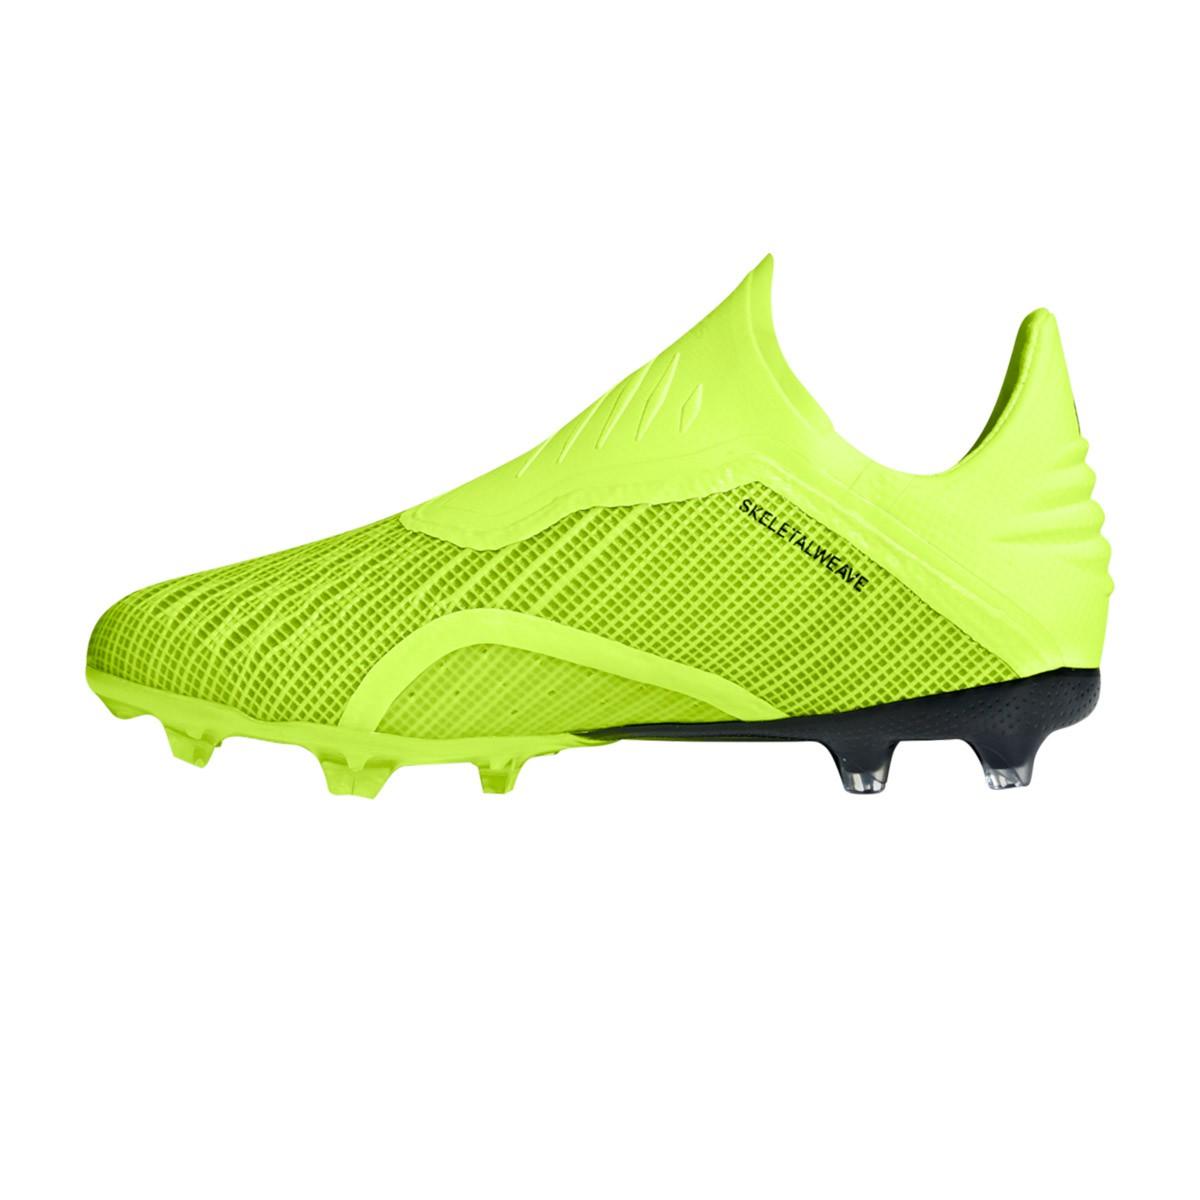 fc1cd1bbe Football Boots adidas Kids X 18+ FG Solar yellow-Core black-White -  Football store Fútbol Emotion